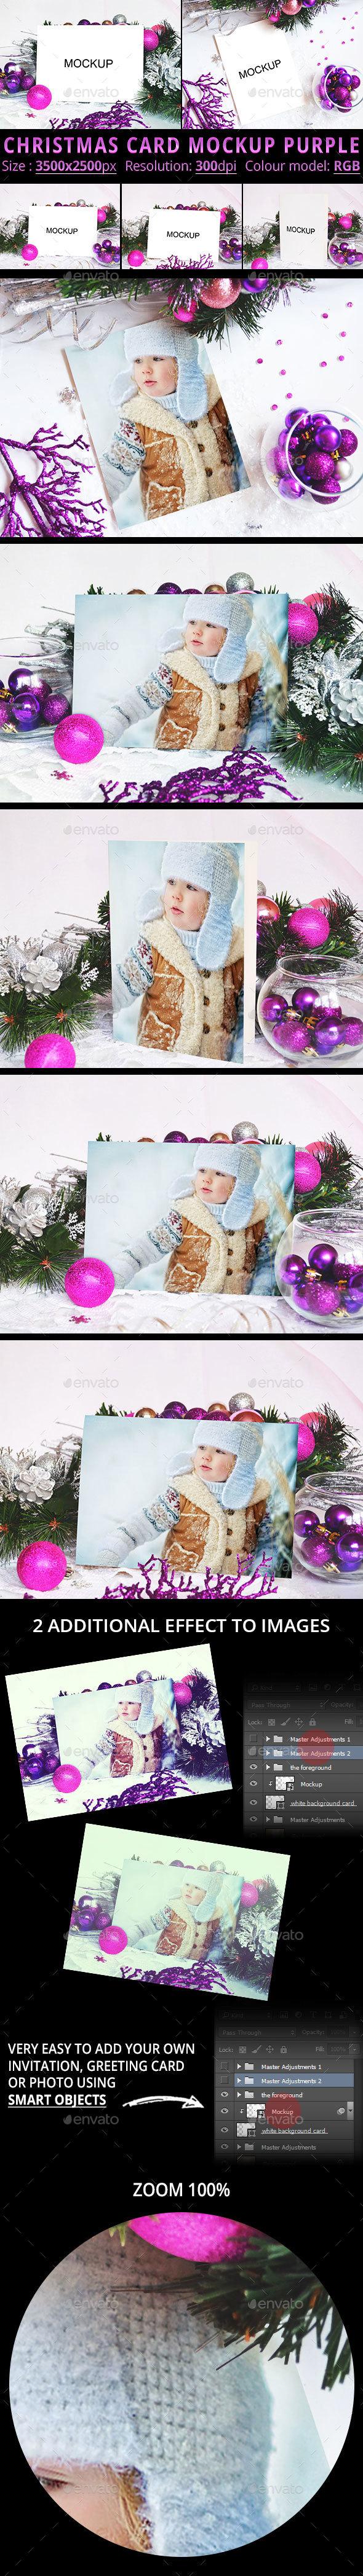 Christmas Card Mockup Purple